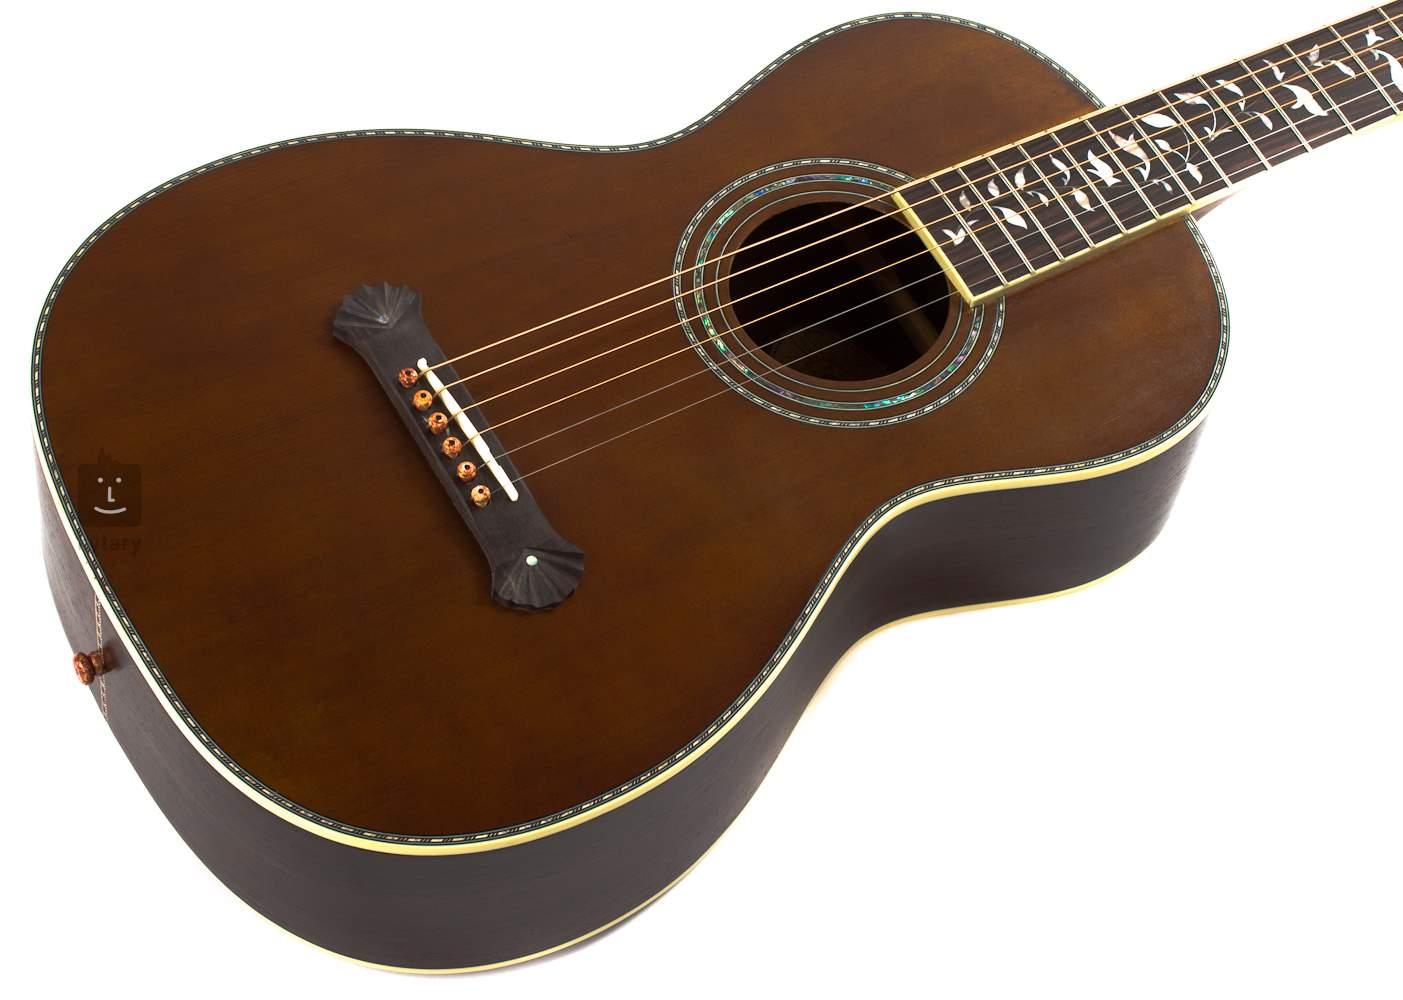 Washburn R320swrk D U Acoustic Guitar